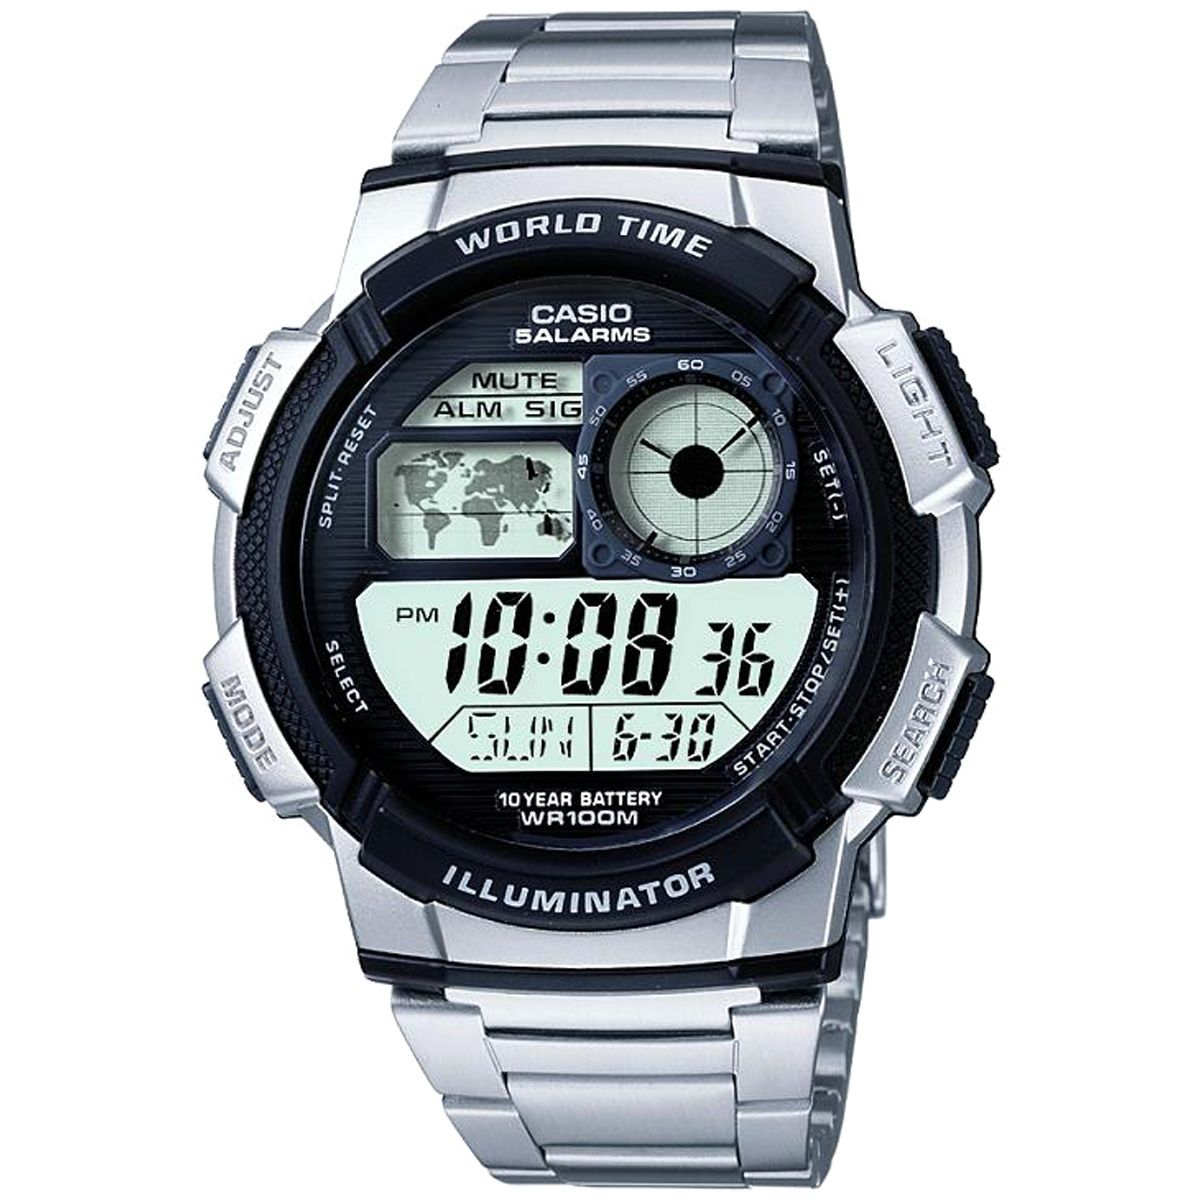 Gents casio world timer alarm chronograph watch ae 1000wd 1avef mens casio world timer alarm chronograph watch ae 1000wd 1avef gumiabroncs Choice Image